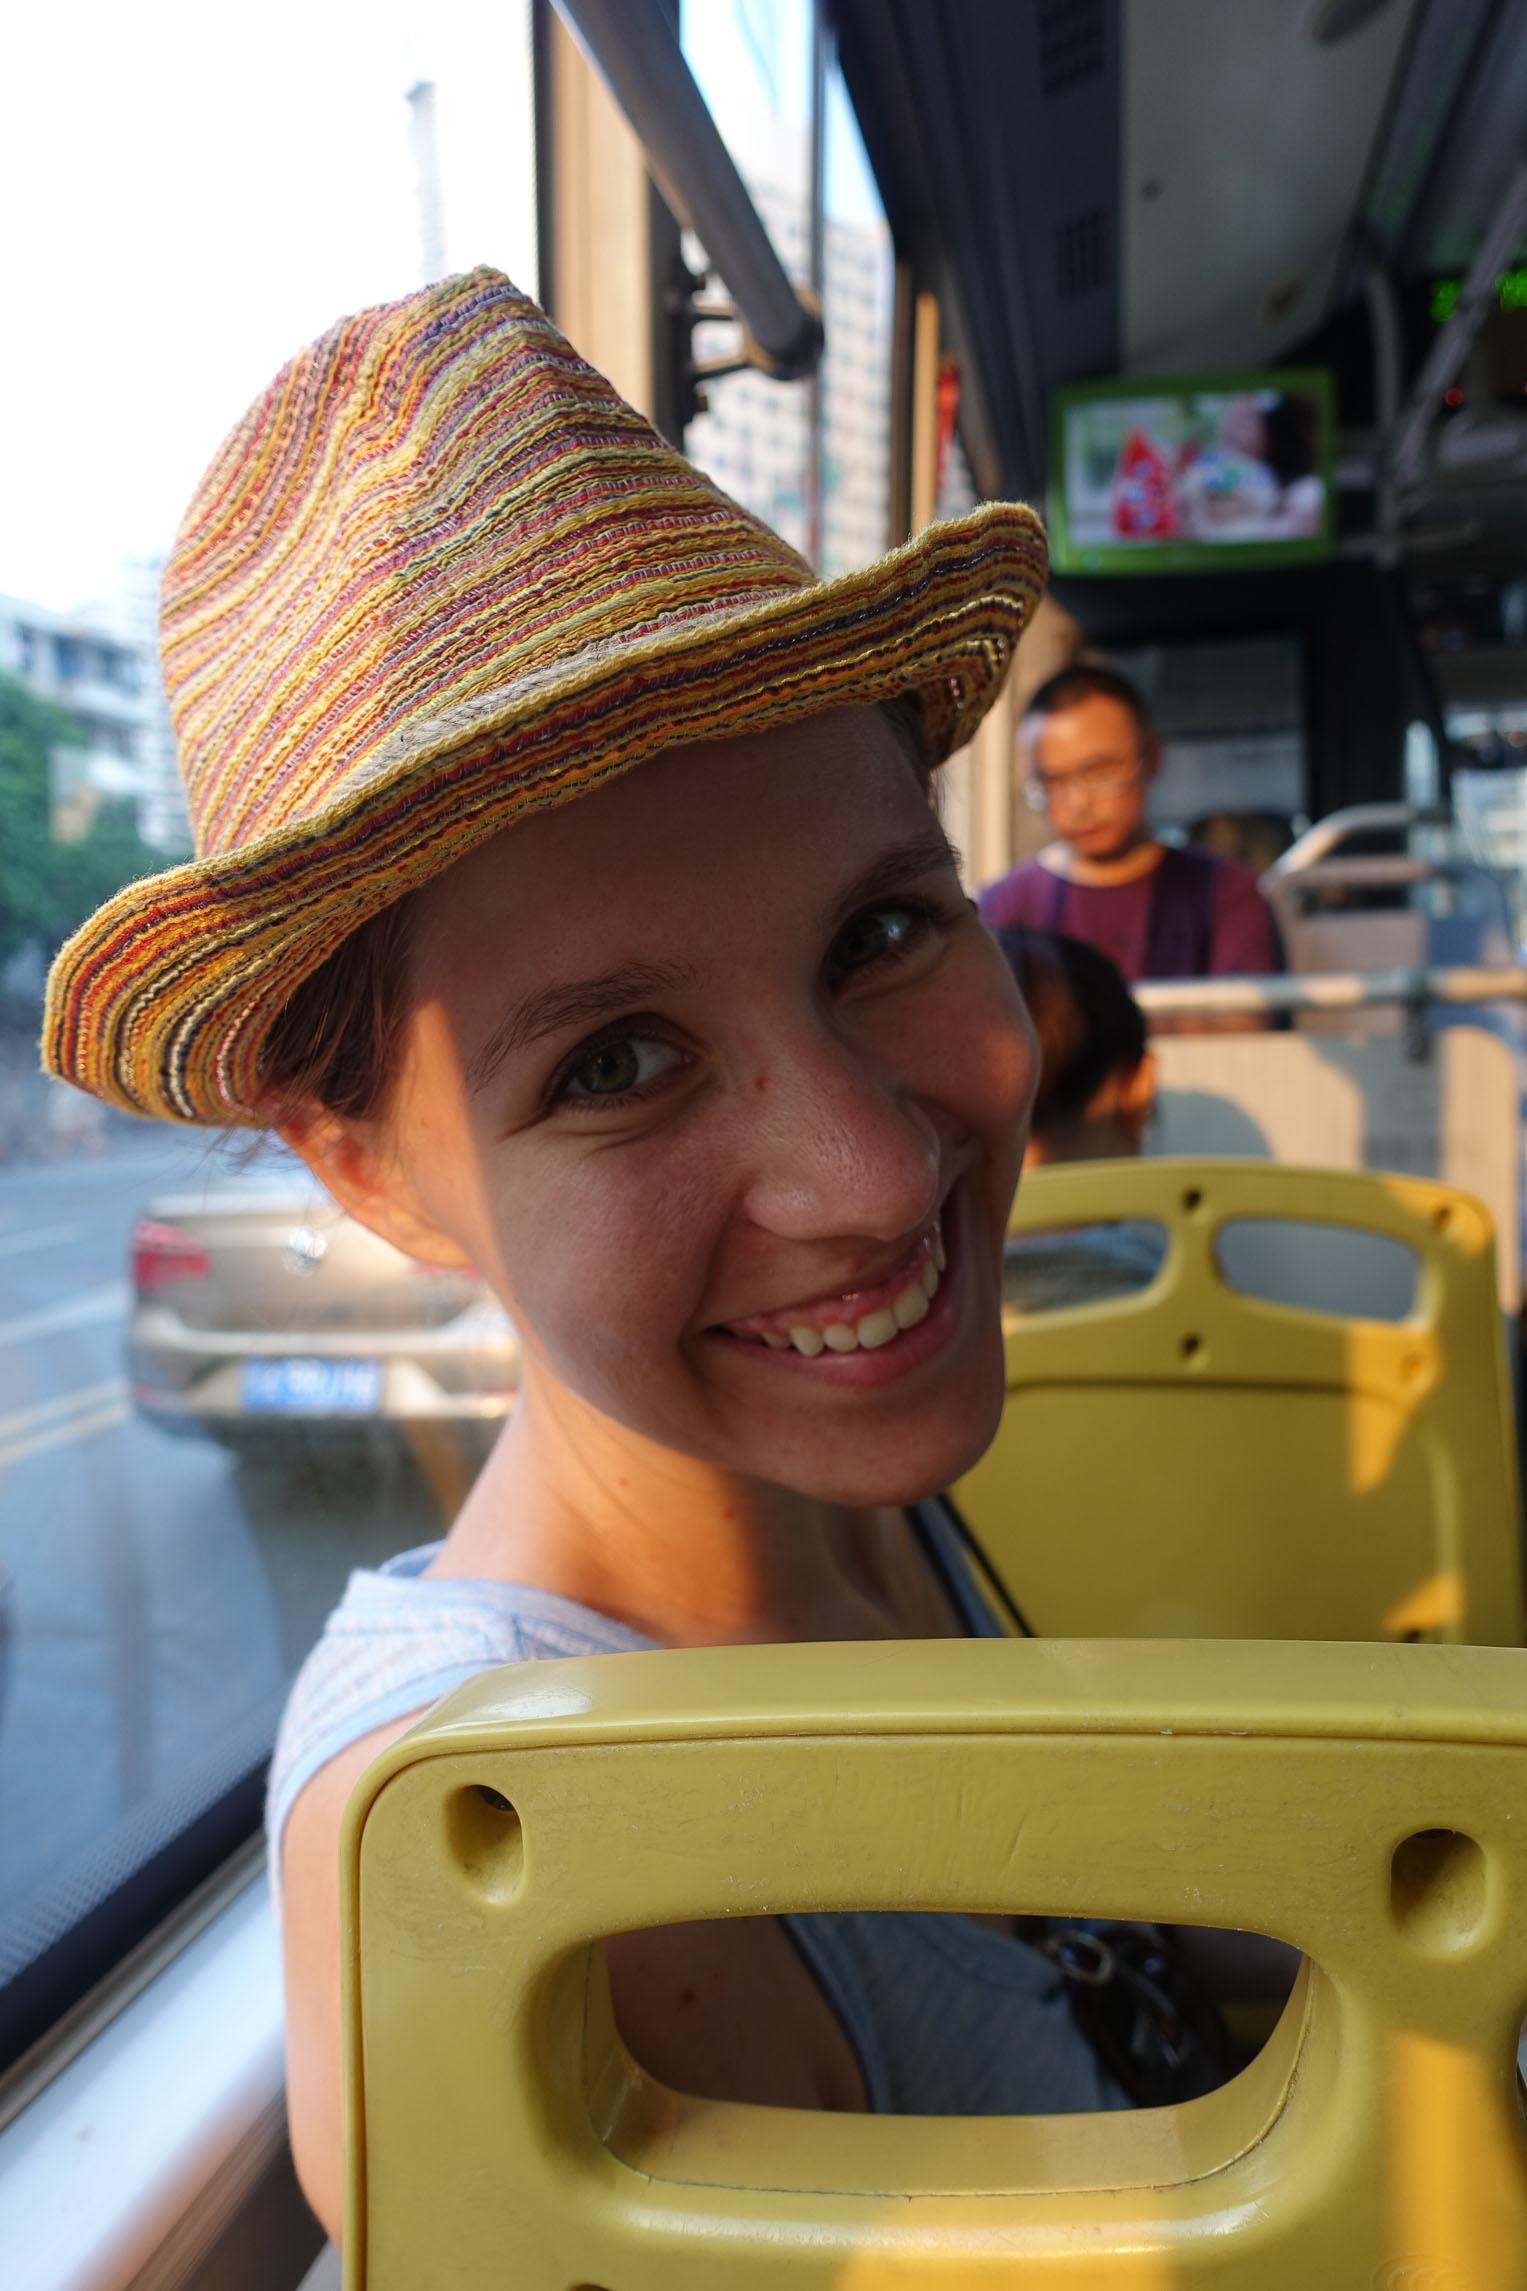 Petra enjoying the bus